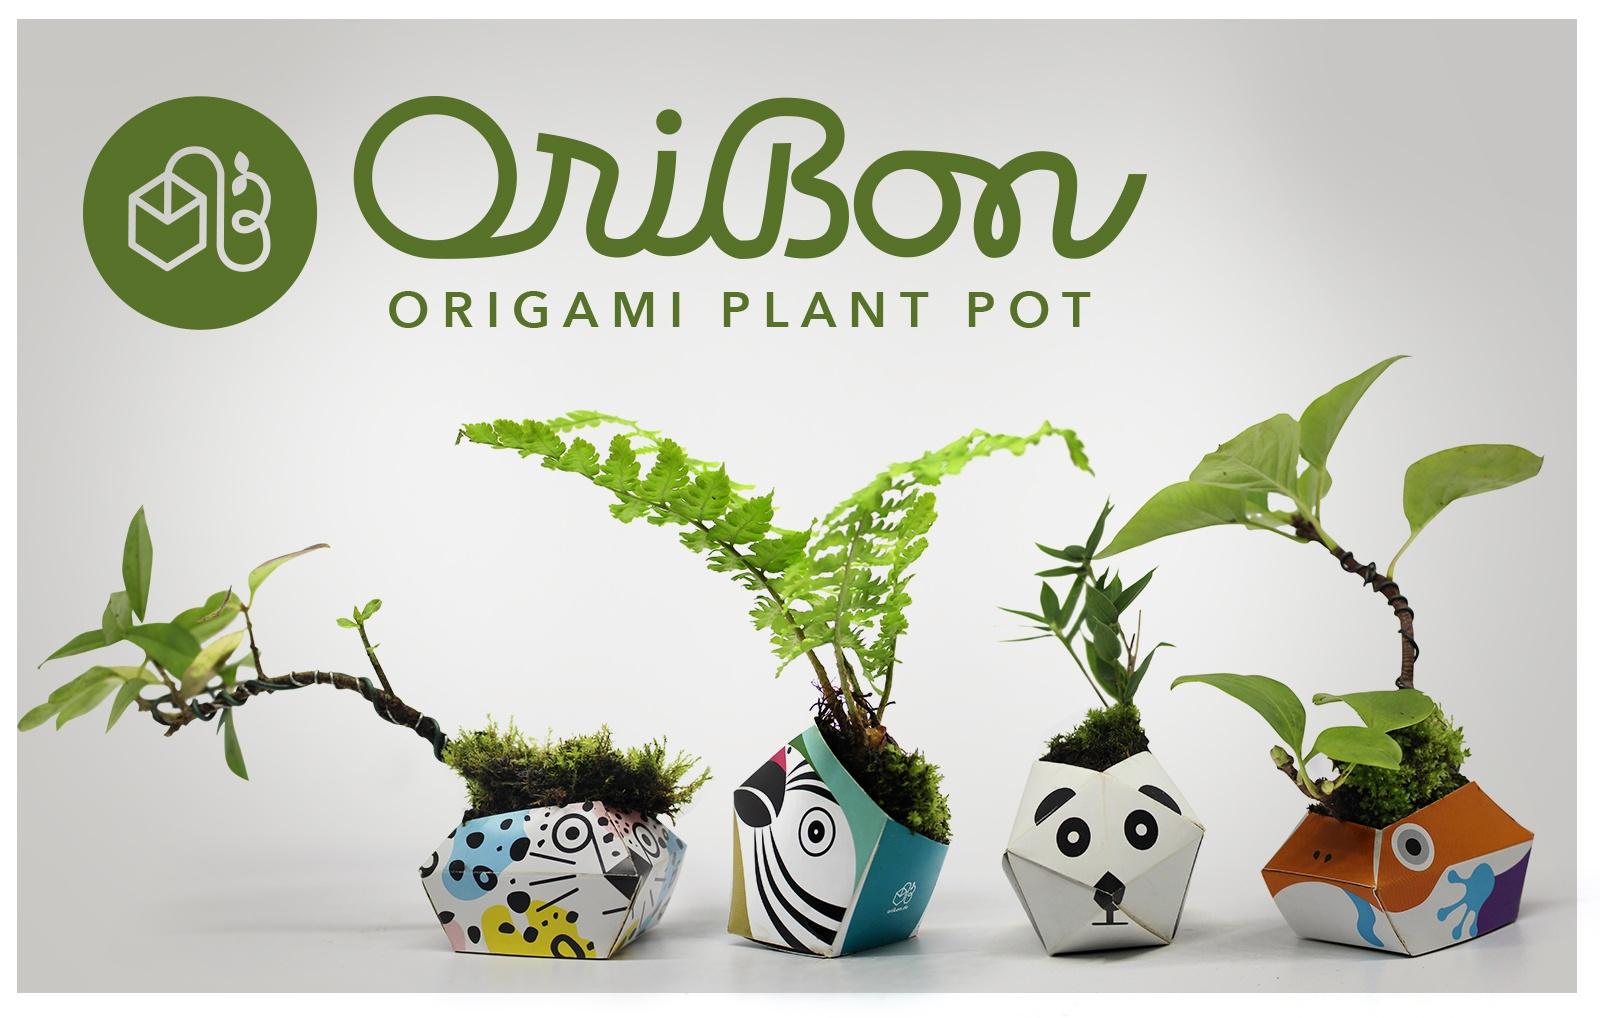 OriBon